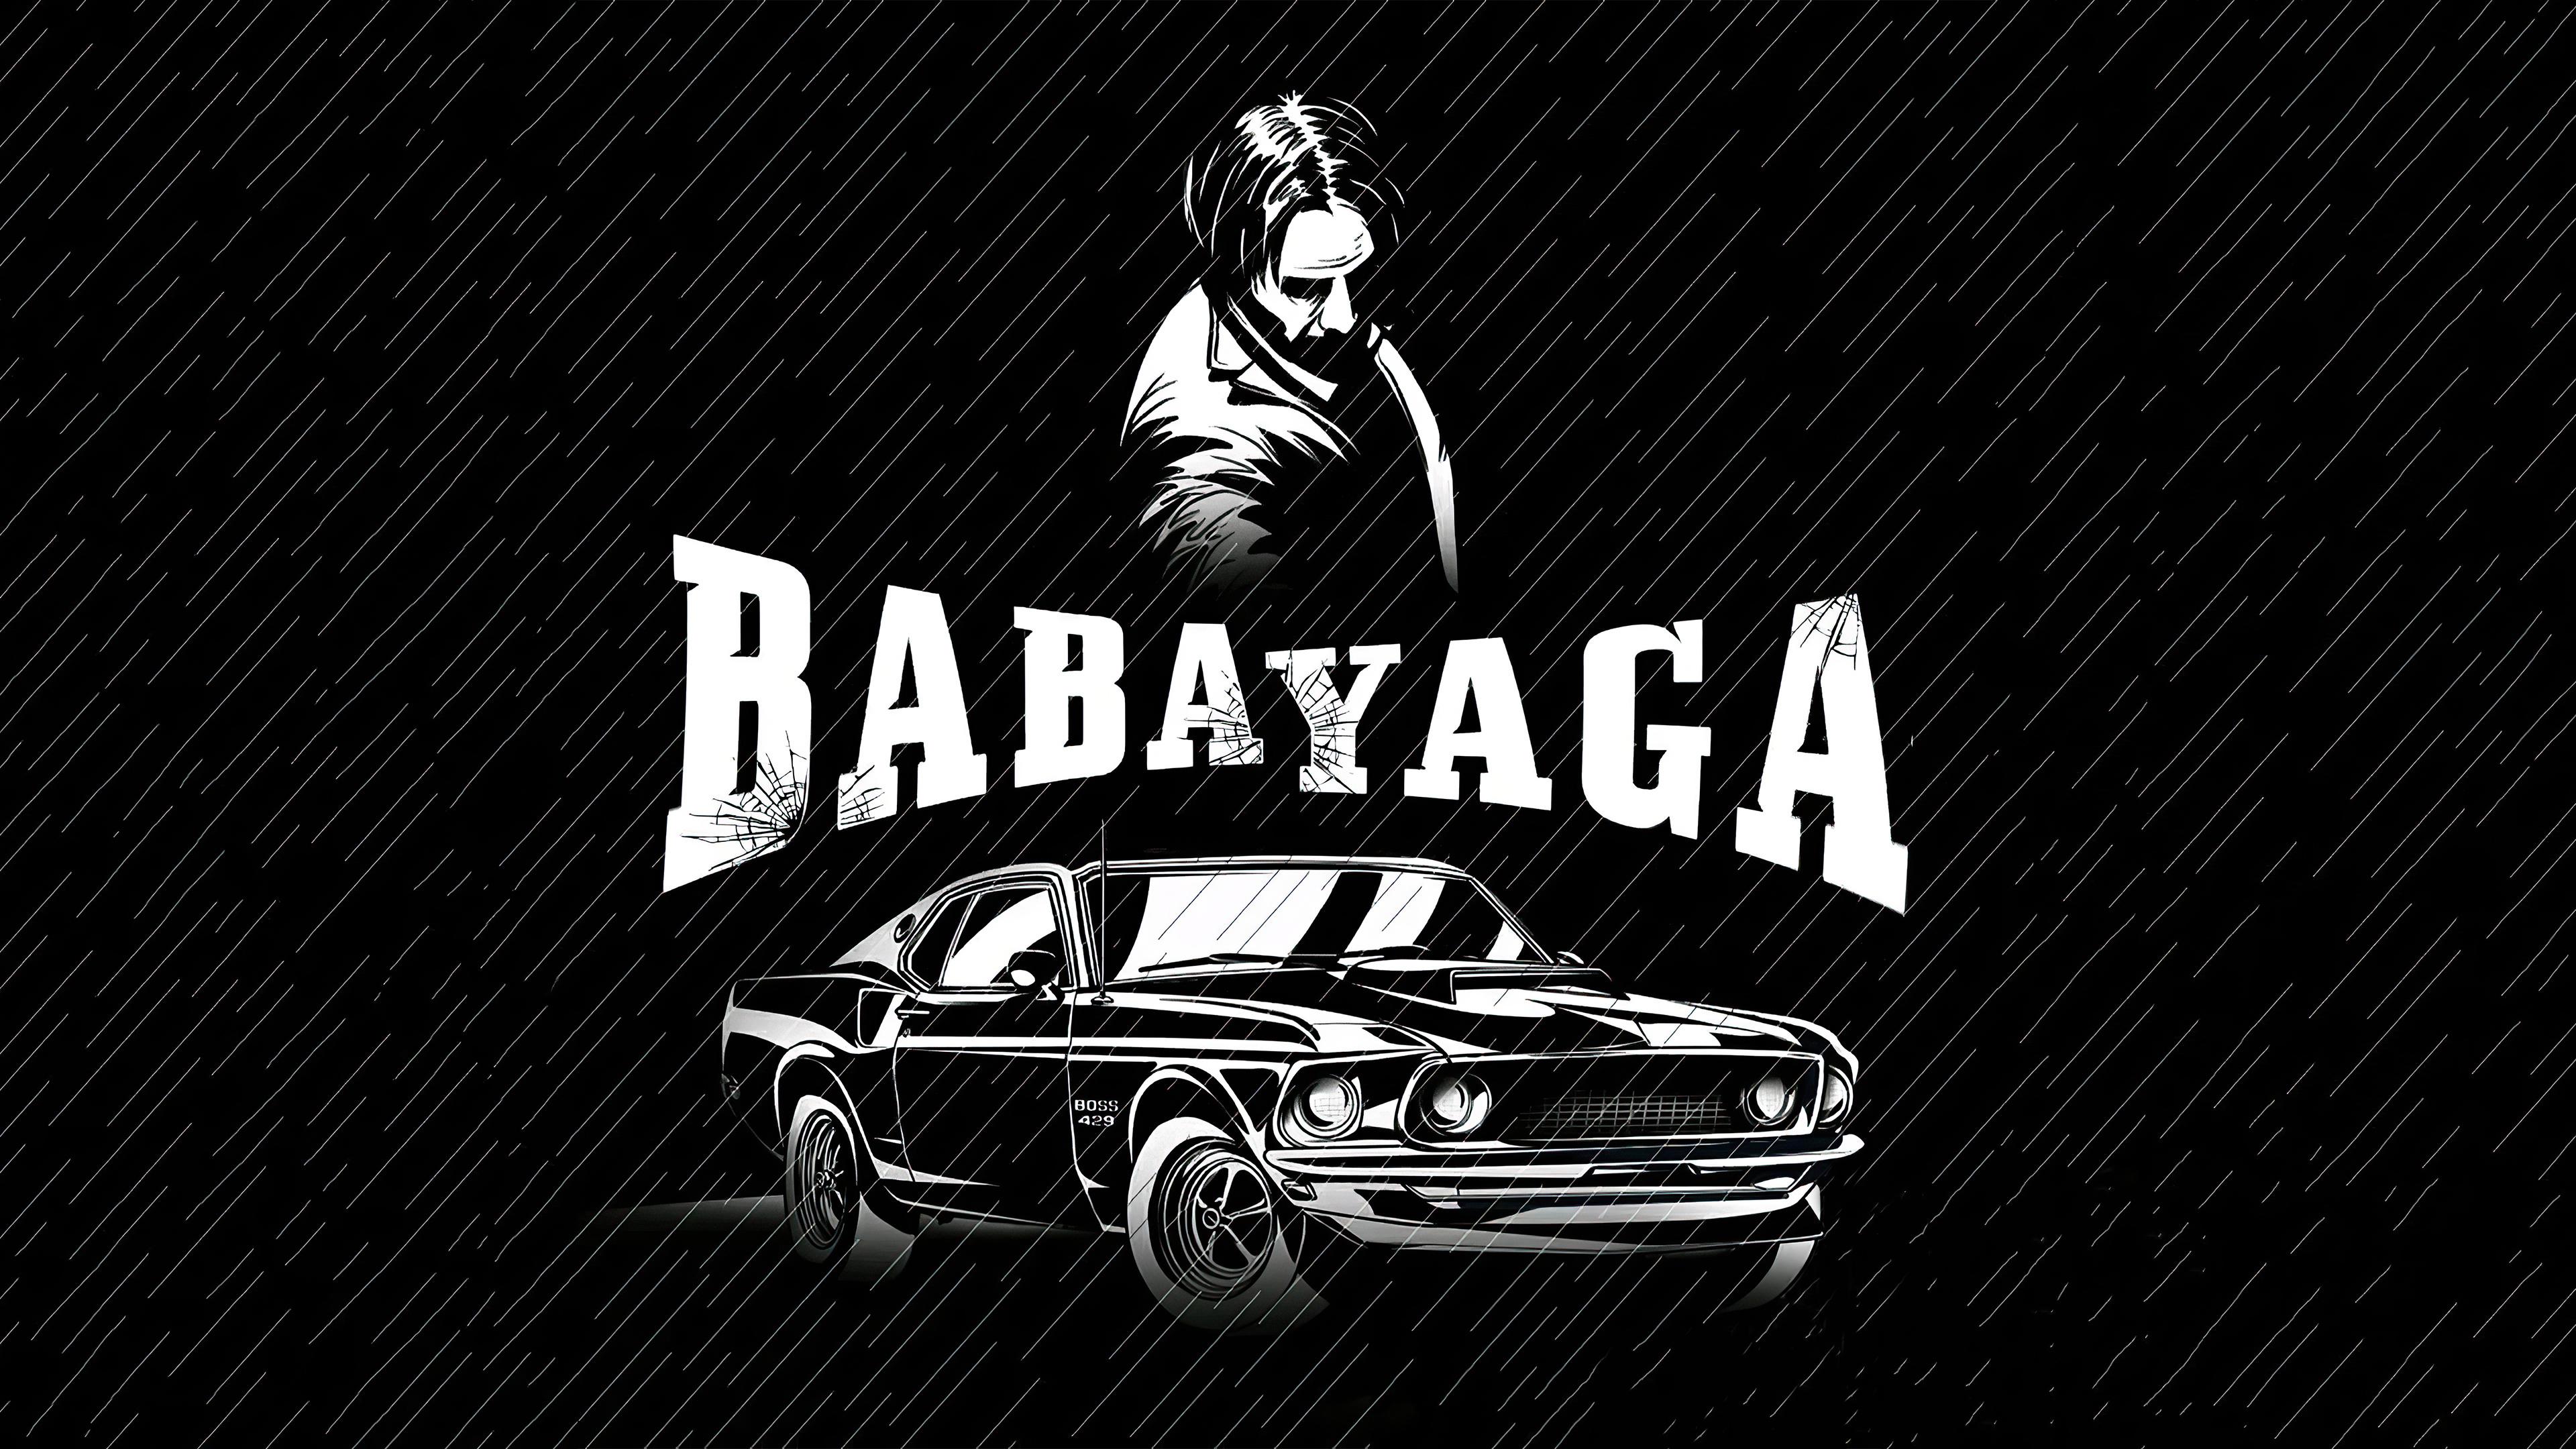 baba yaga 1596931152 - Baba Yaga - Baba Yaga wallpapers, Baba Yaga john wıck wallpapers 4k, Baba Yaga 4k wallpapers